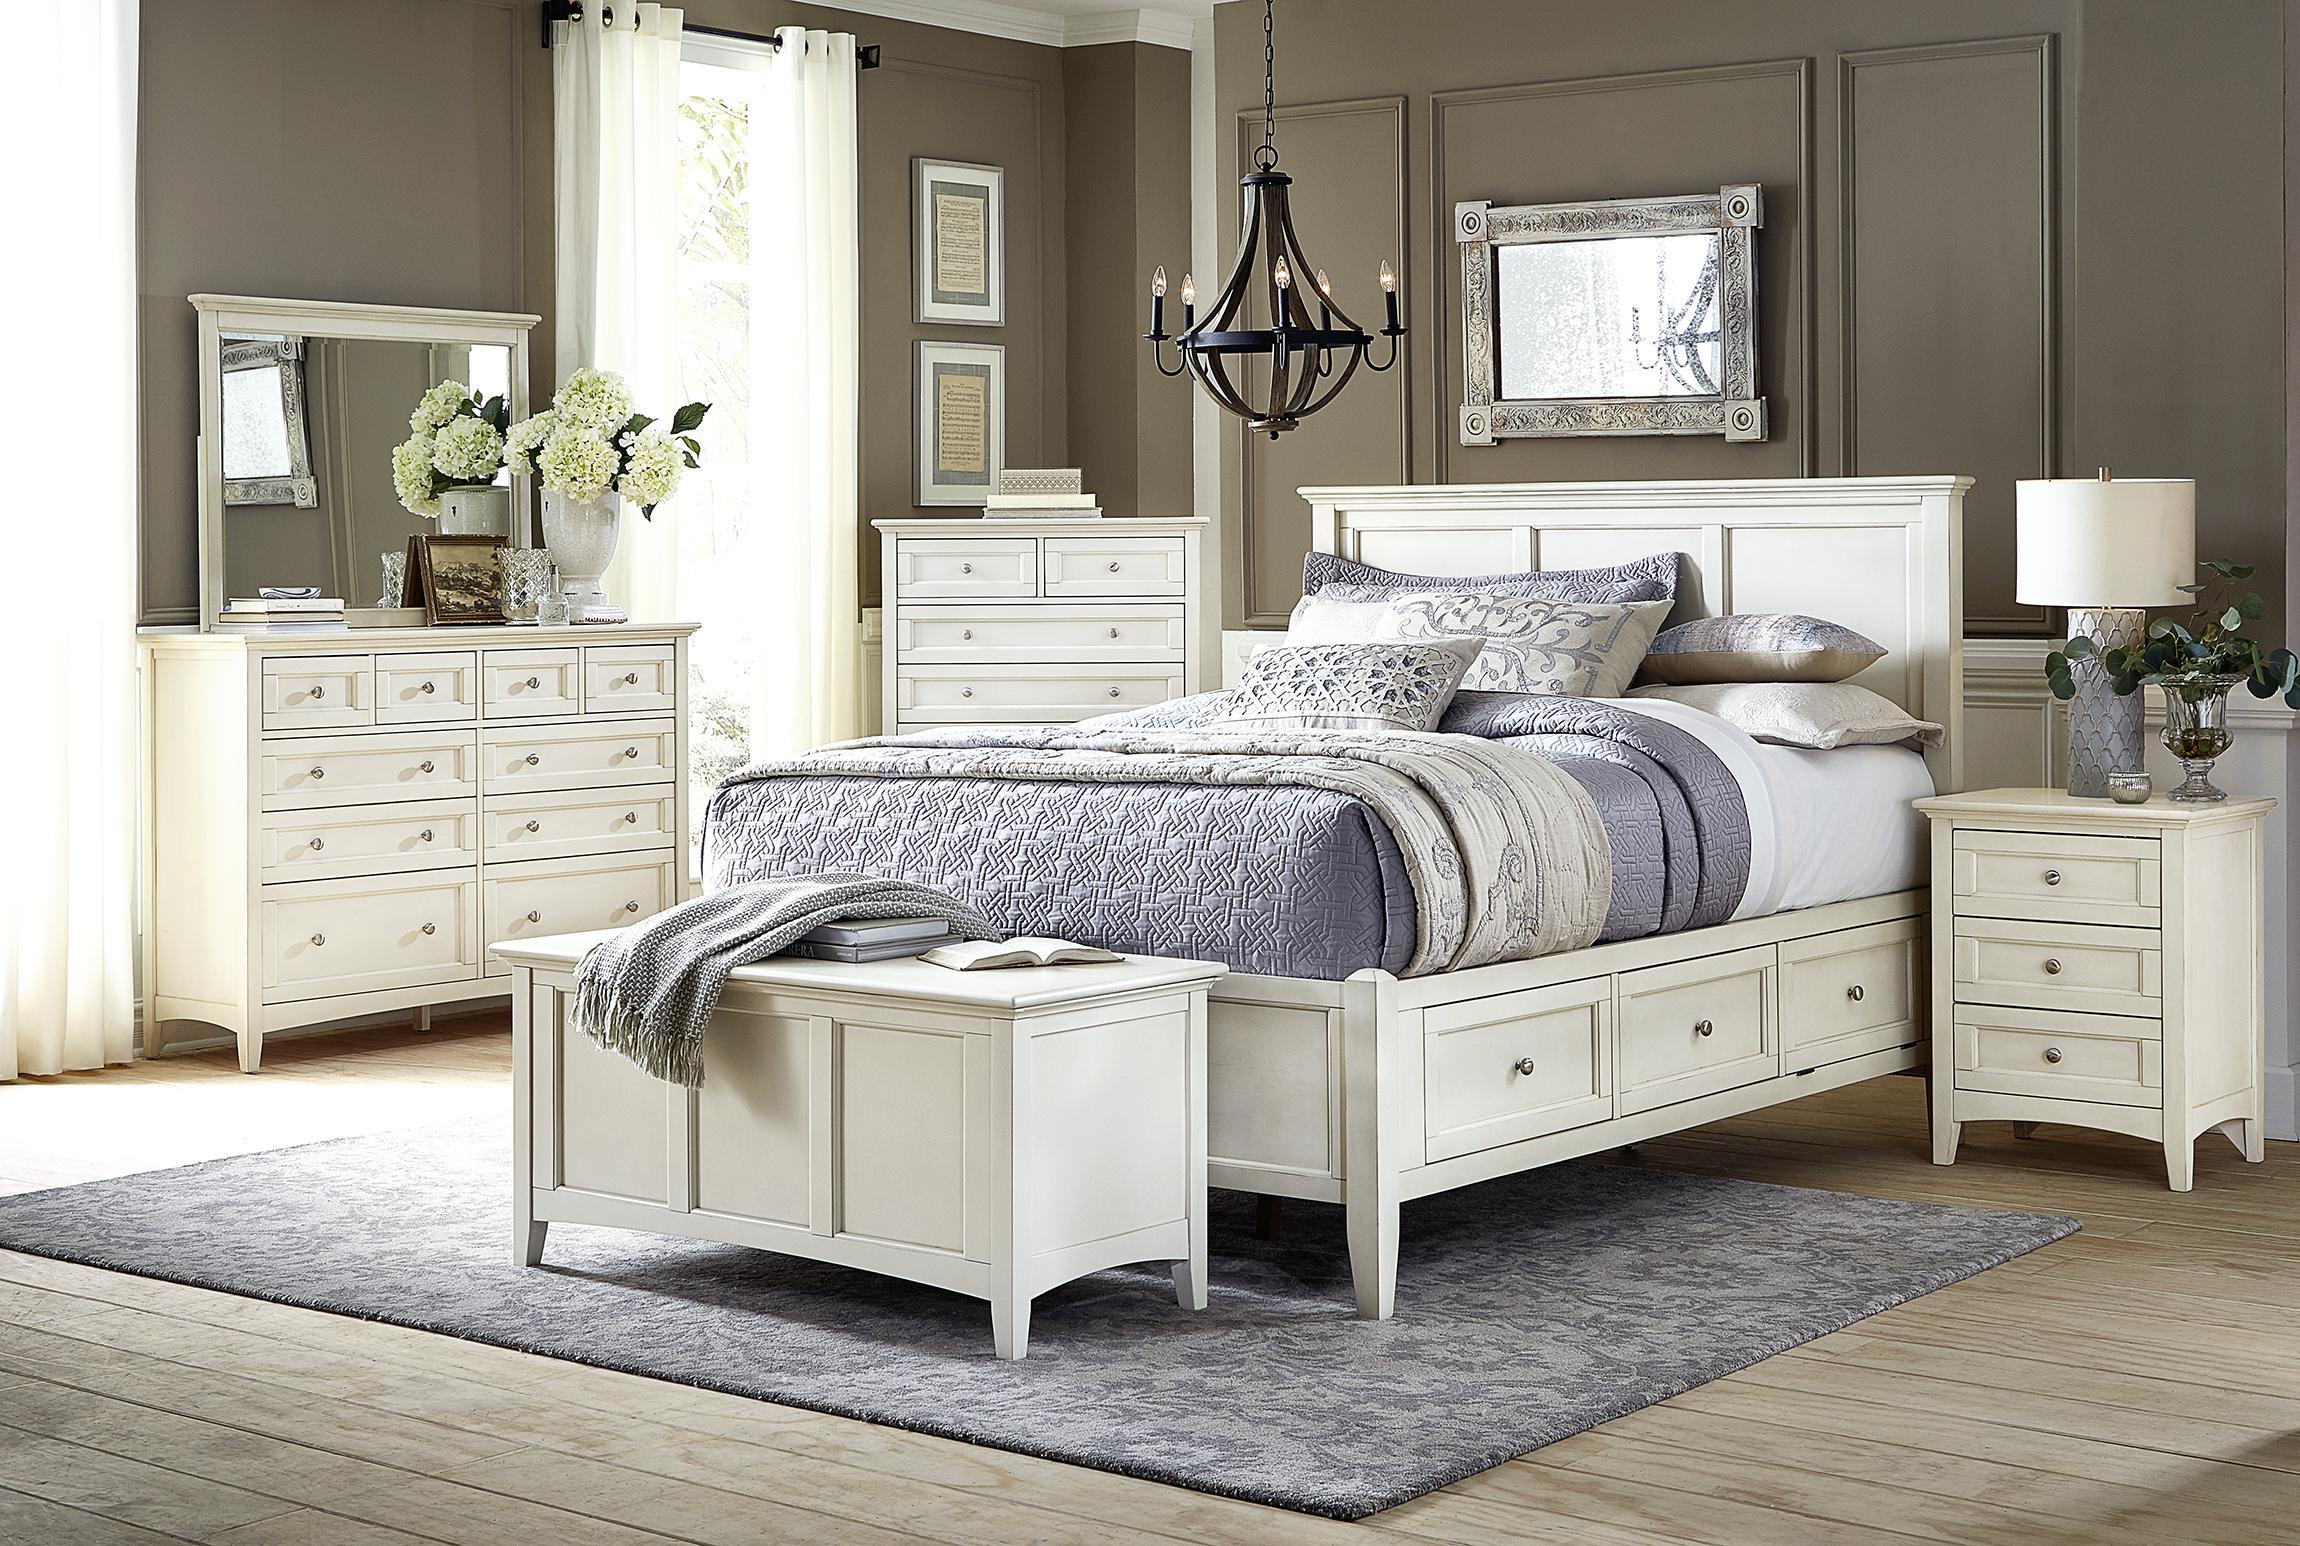 cottage king storage bedroom set 4ps white linen nrlwt5131